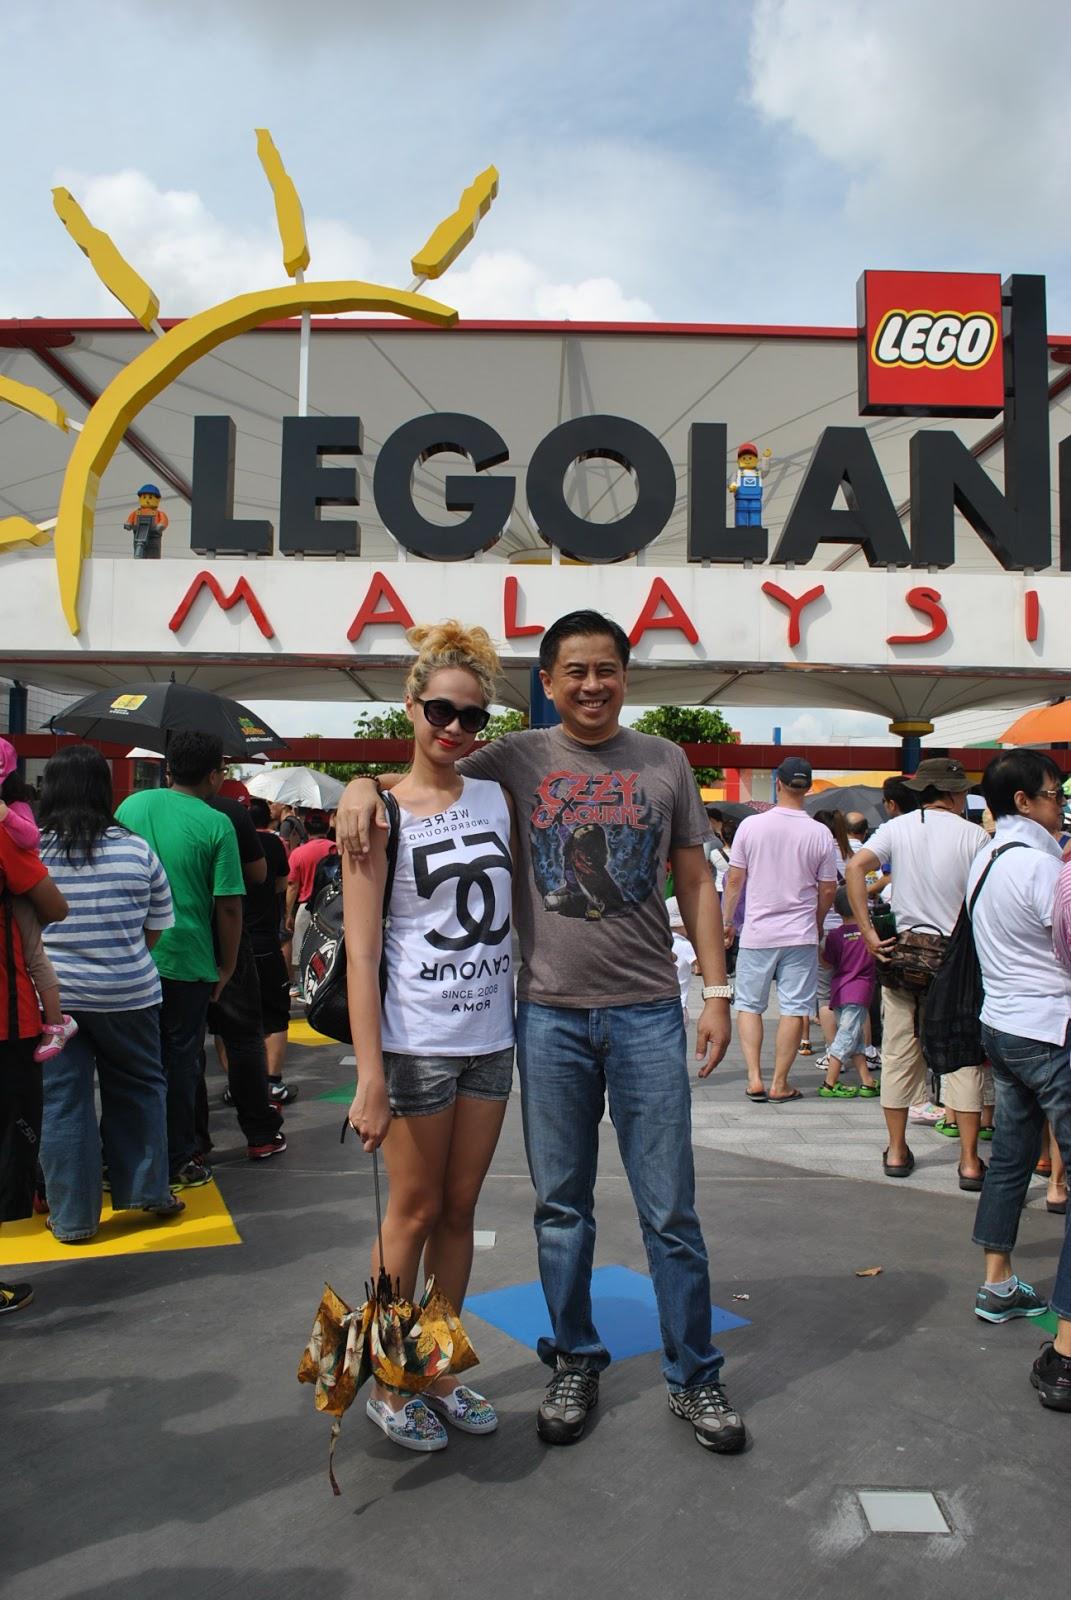 Legoland | Malaysia - Kyrie Moon - Personal Blog